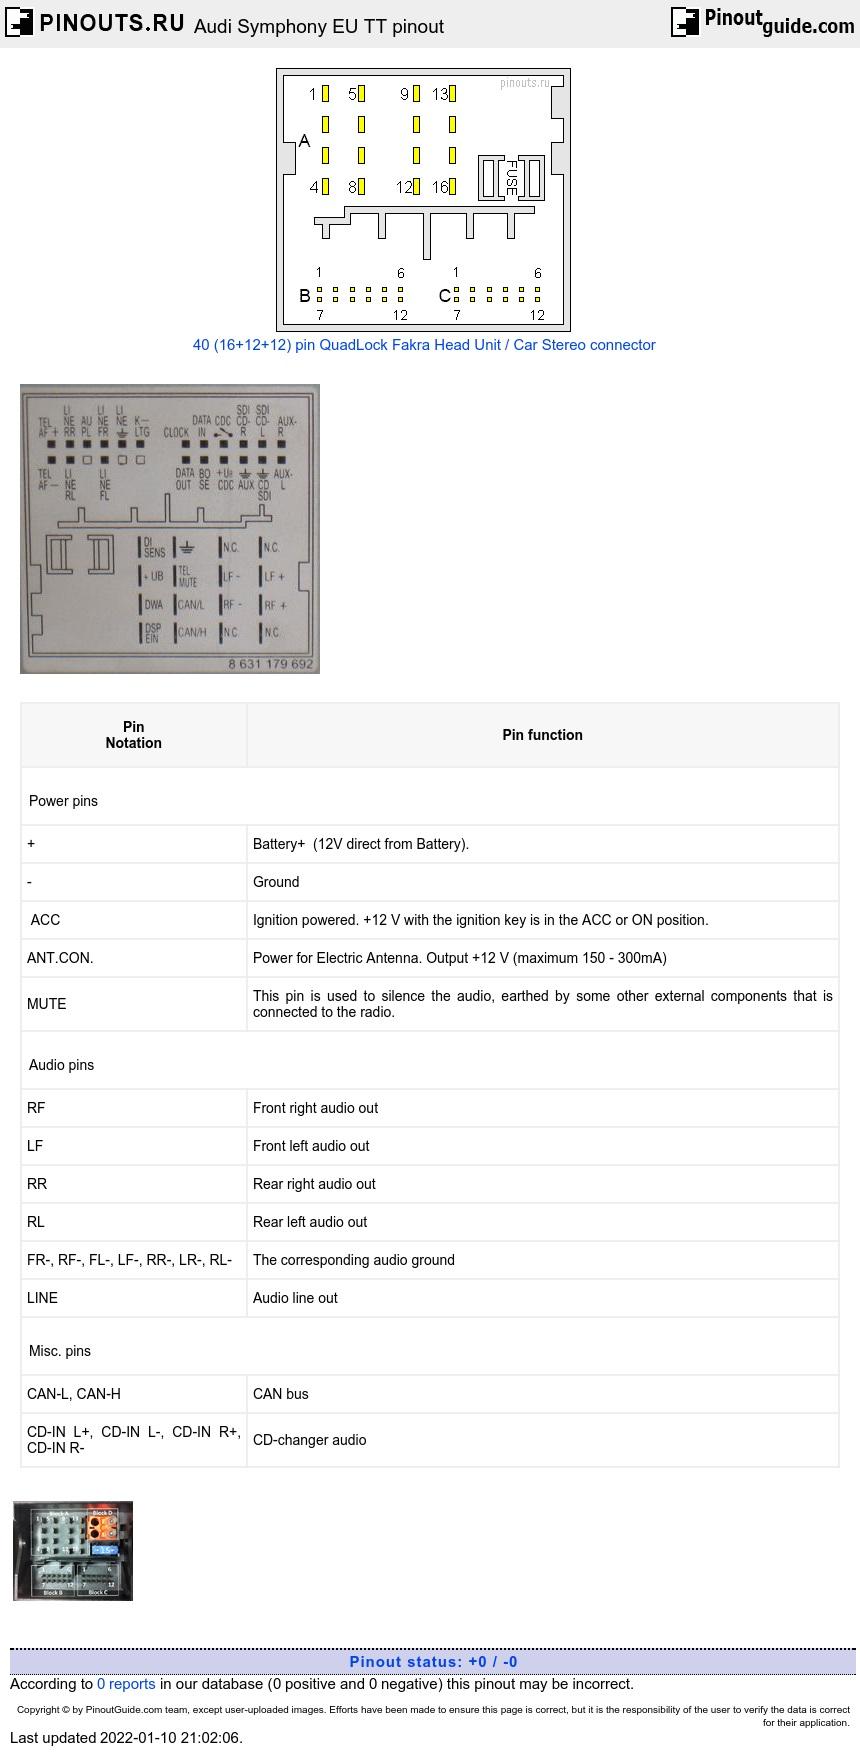 Audi Symphony Eu Tt Pinout Diagram A6 Wiring